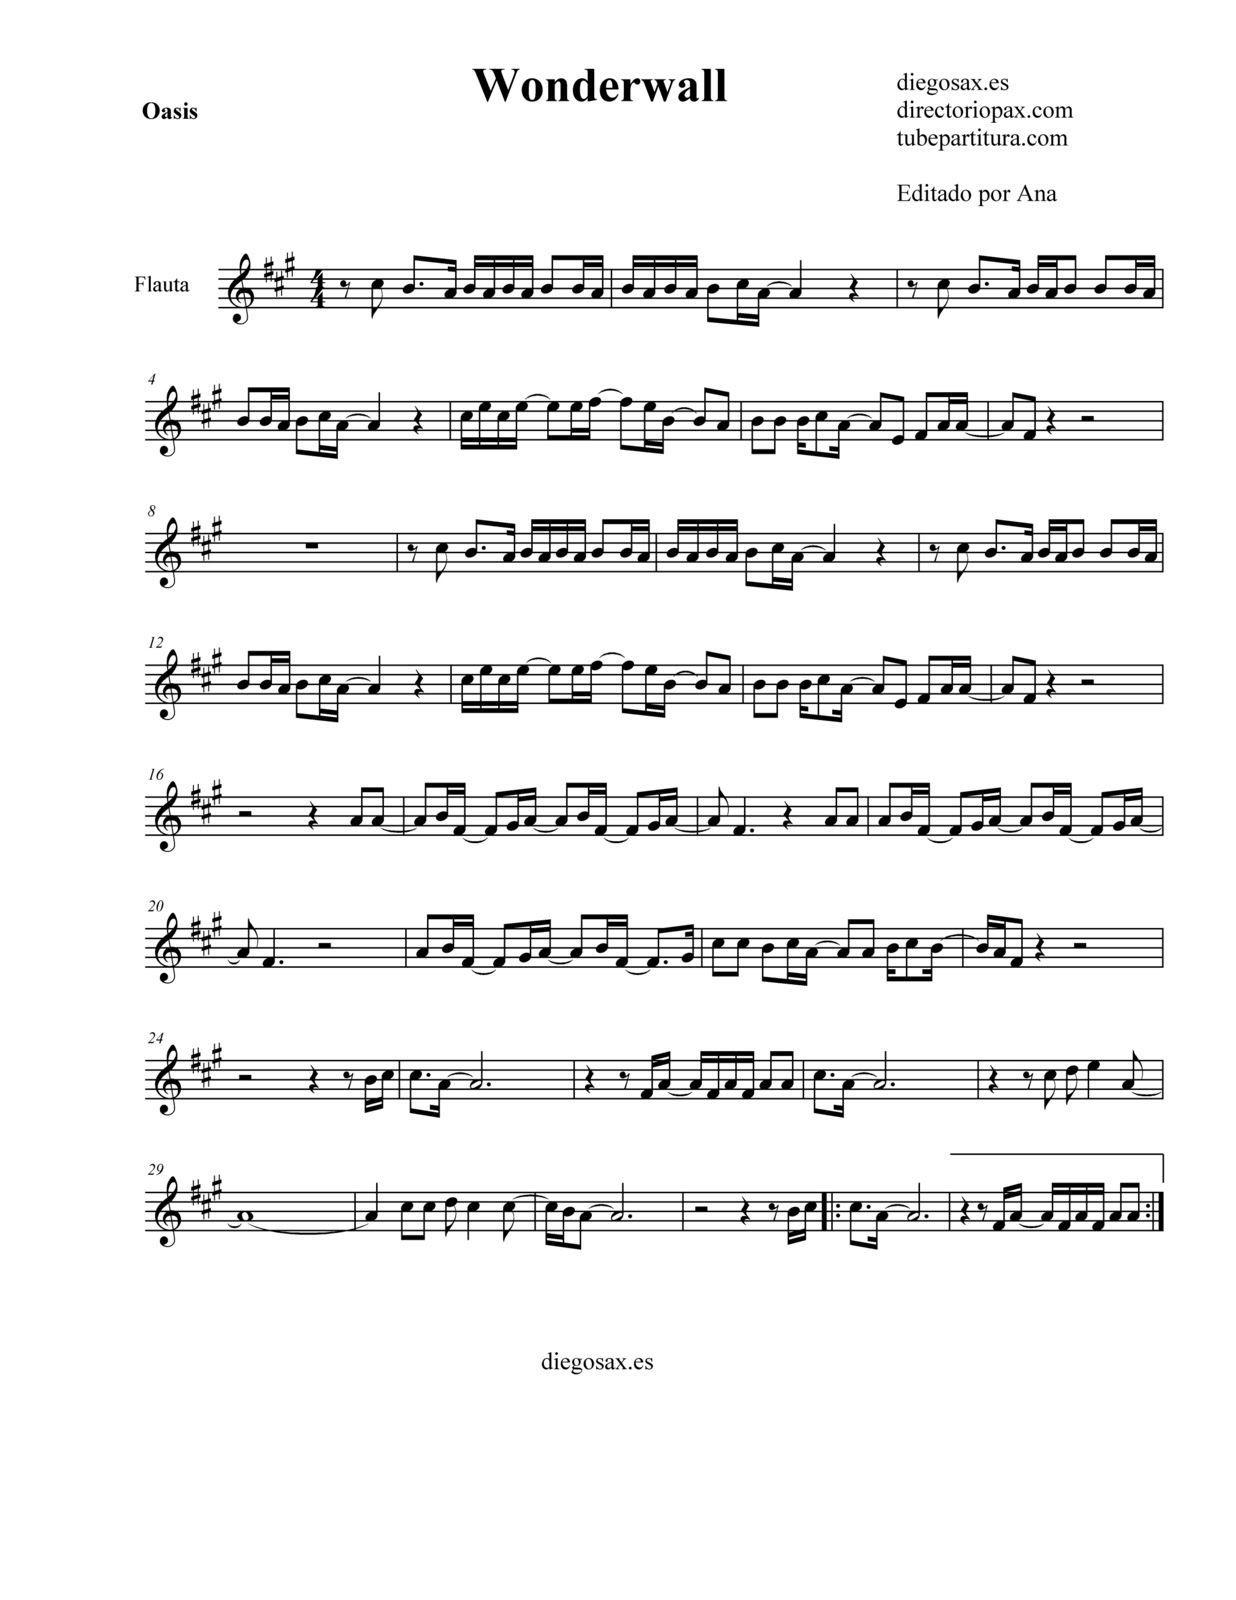 7faa6fa9ed79f820c451661b4213b901 Jpg 1236 1600 Violin Sheet